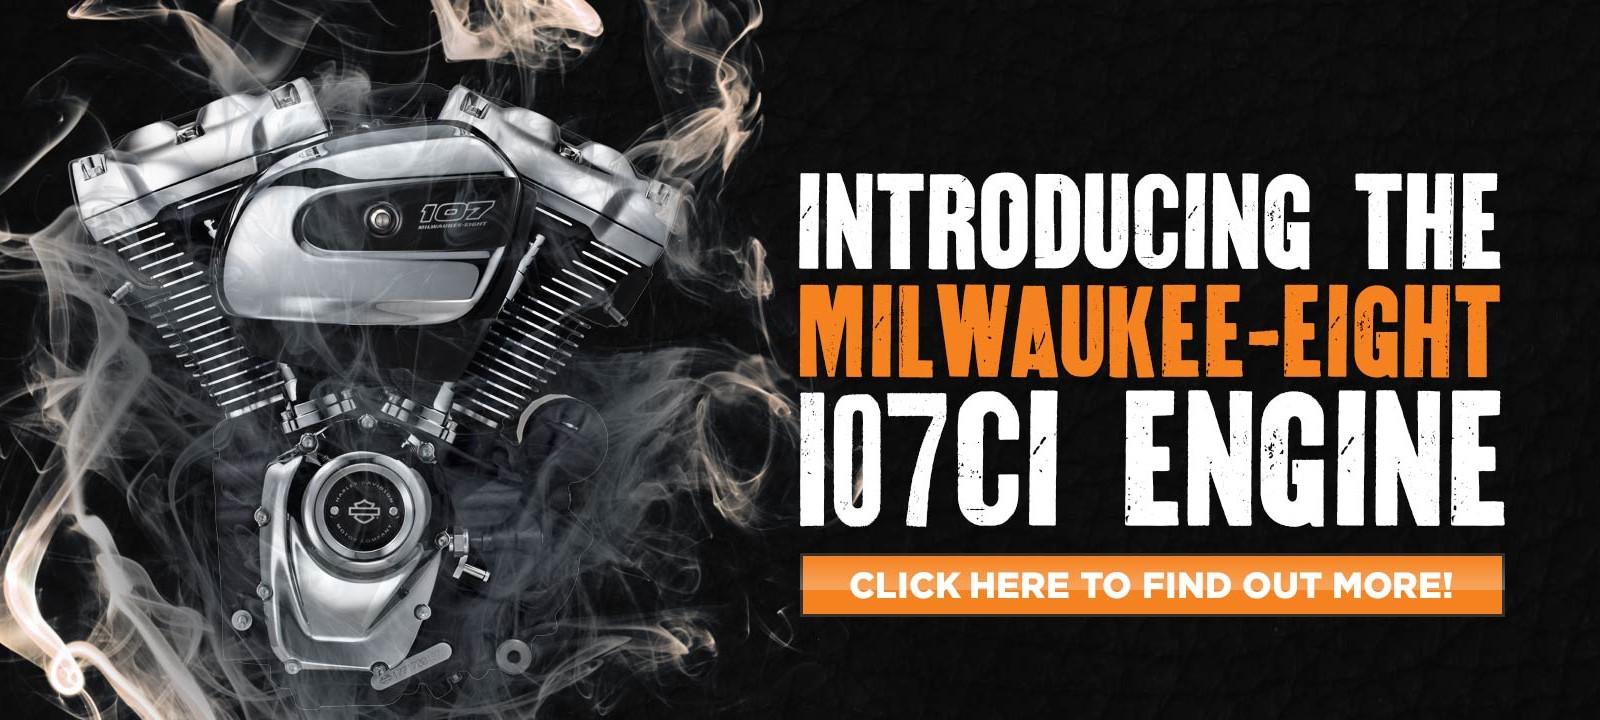 20160823-TMC-1800x720-Milwaukee-8-Engine